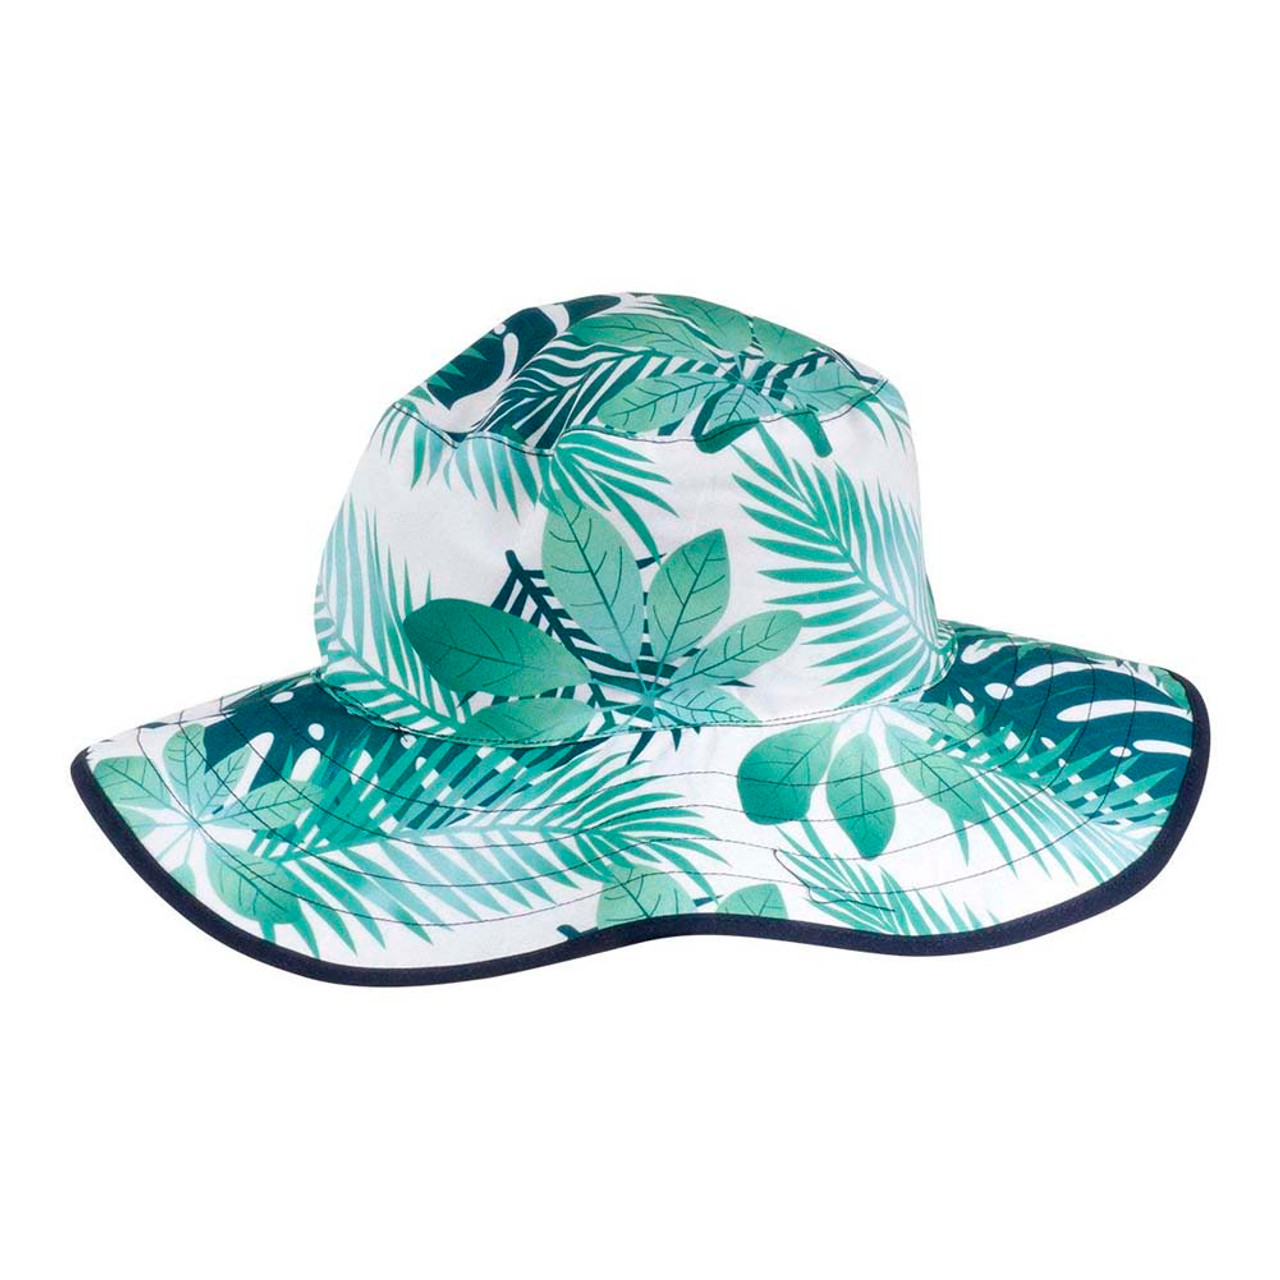 90def2757 Baby Banz Reversible Bucket Hat - Leaf Green/Navy Blue - Dear-Born Baby